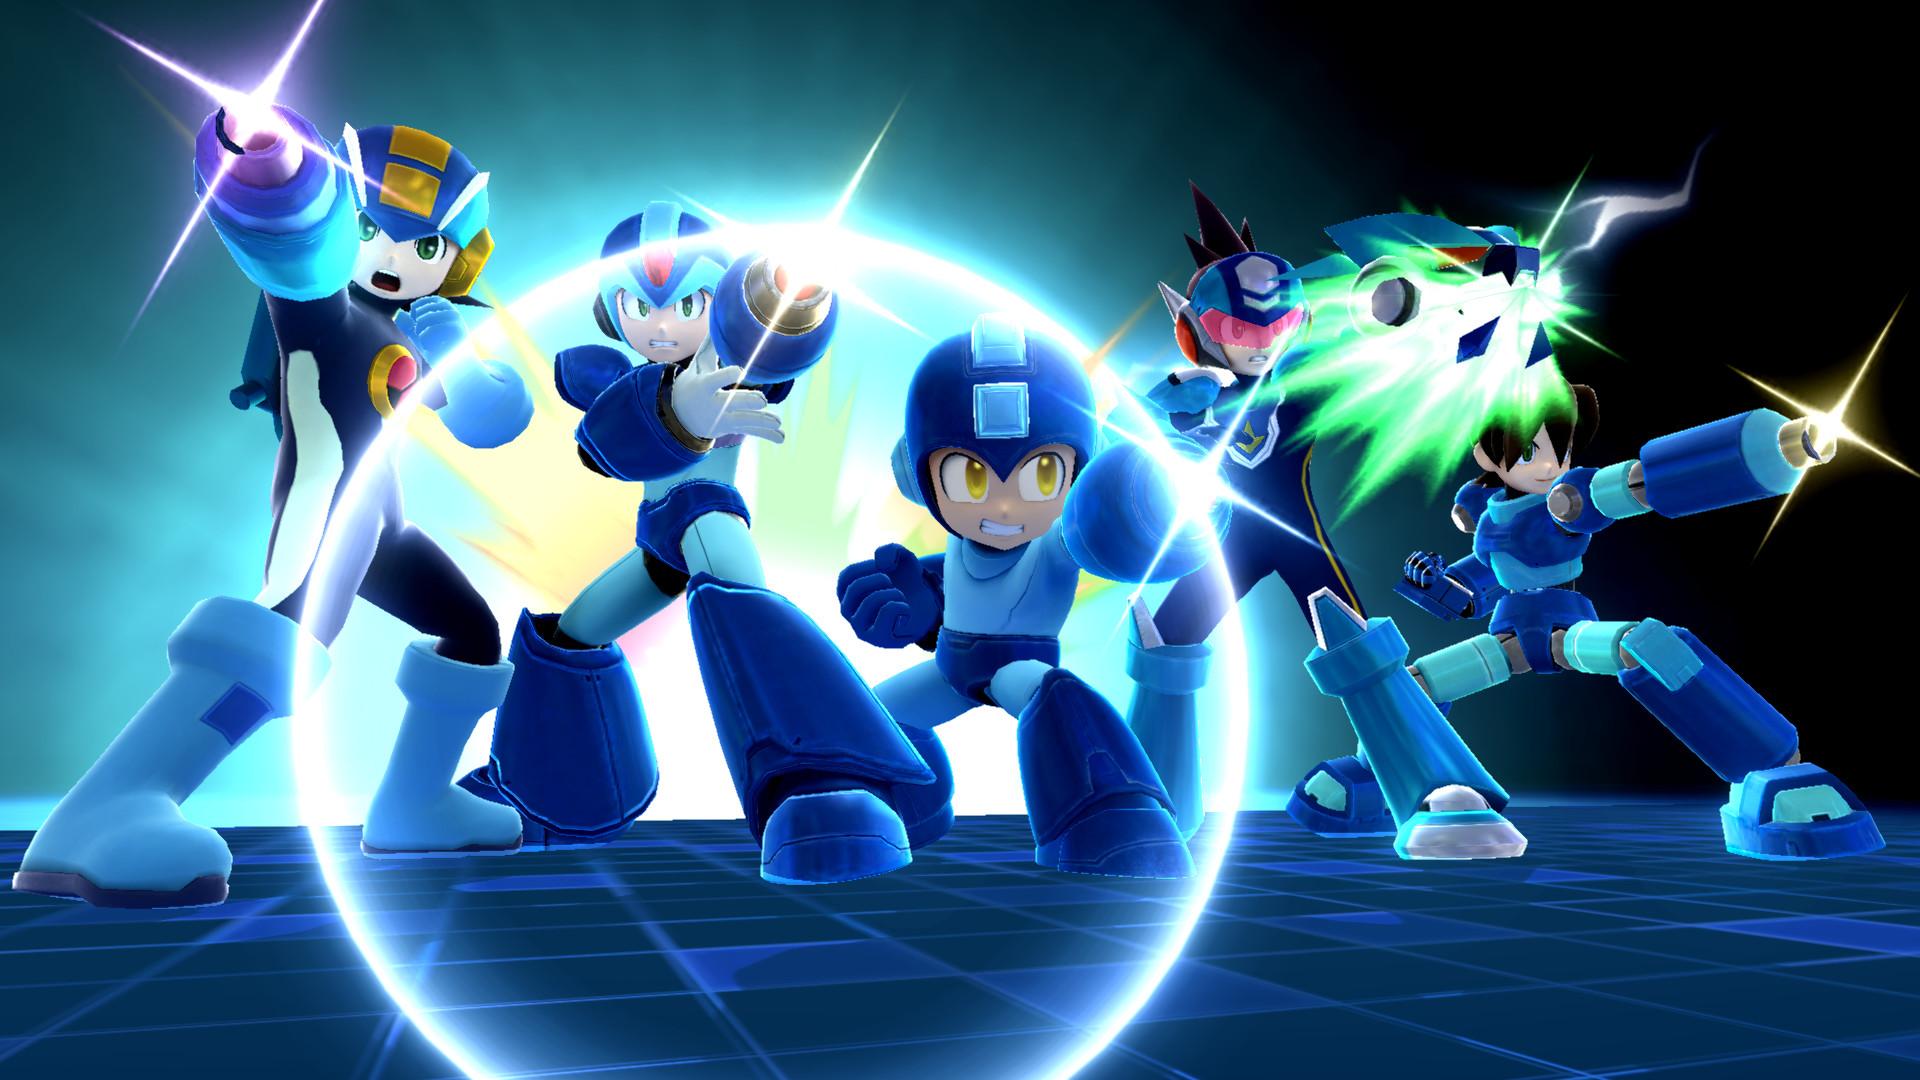 Mega Man using his Final Smash.